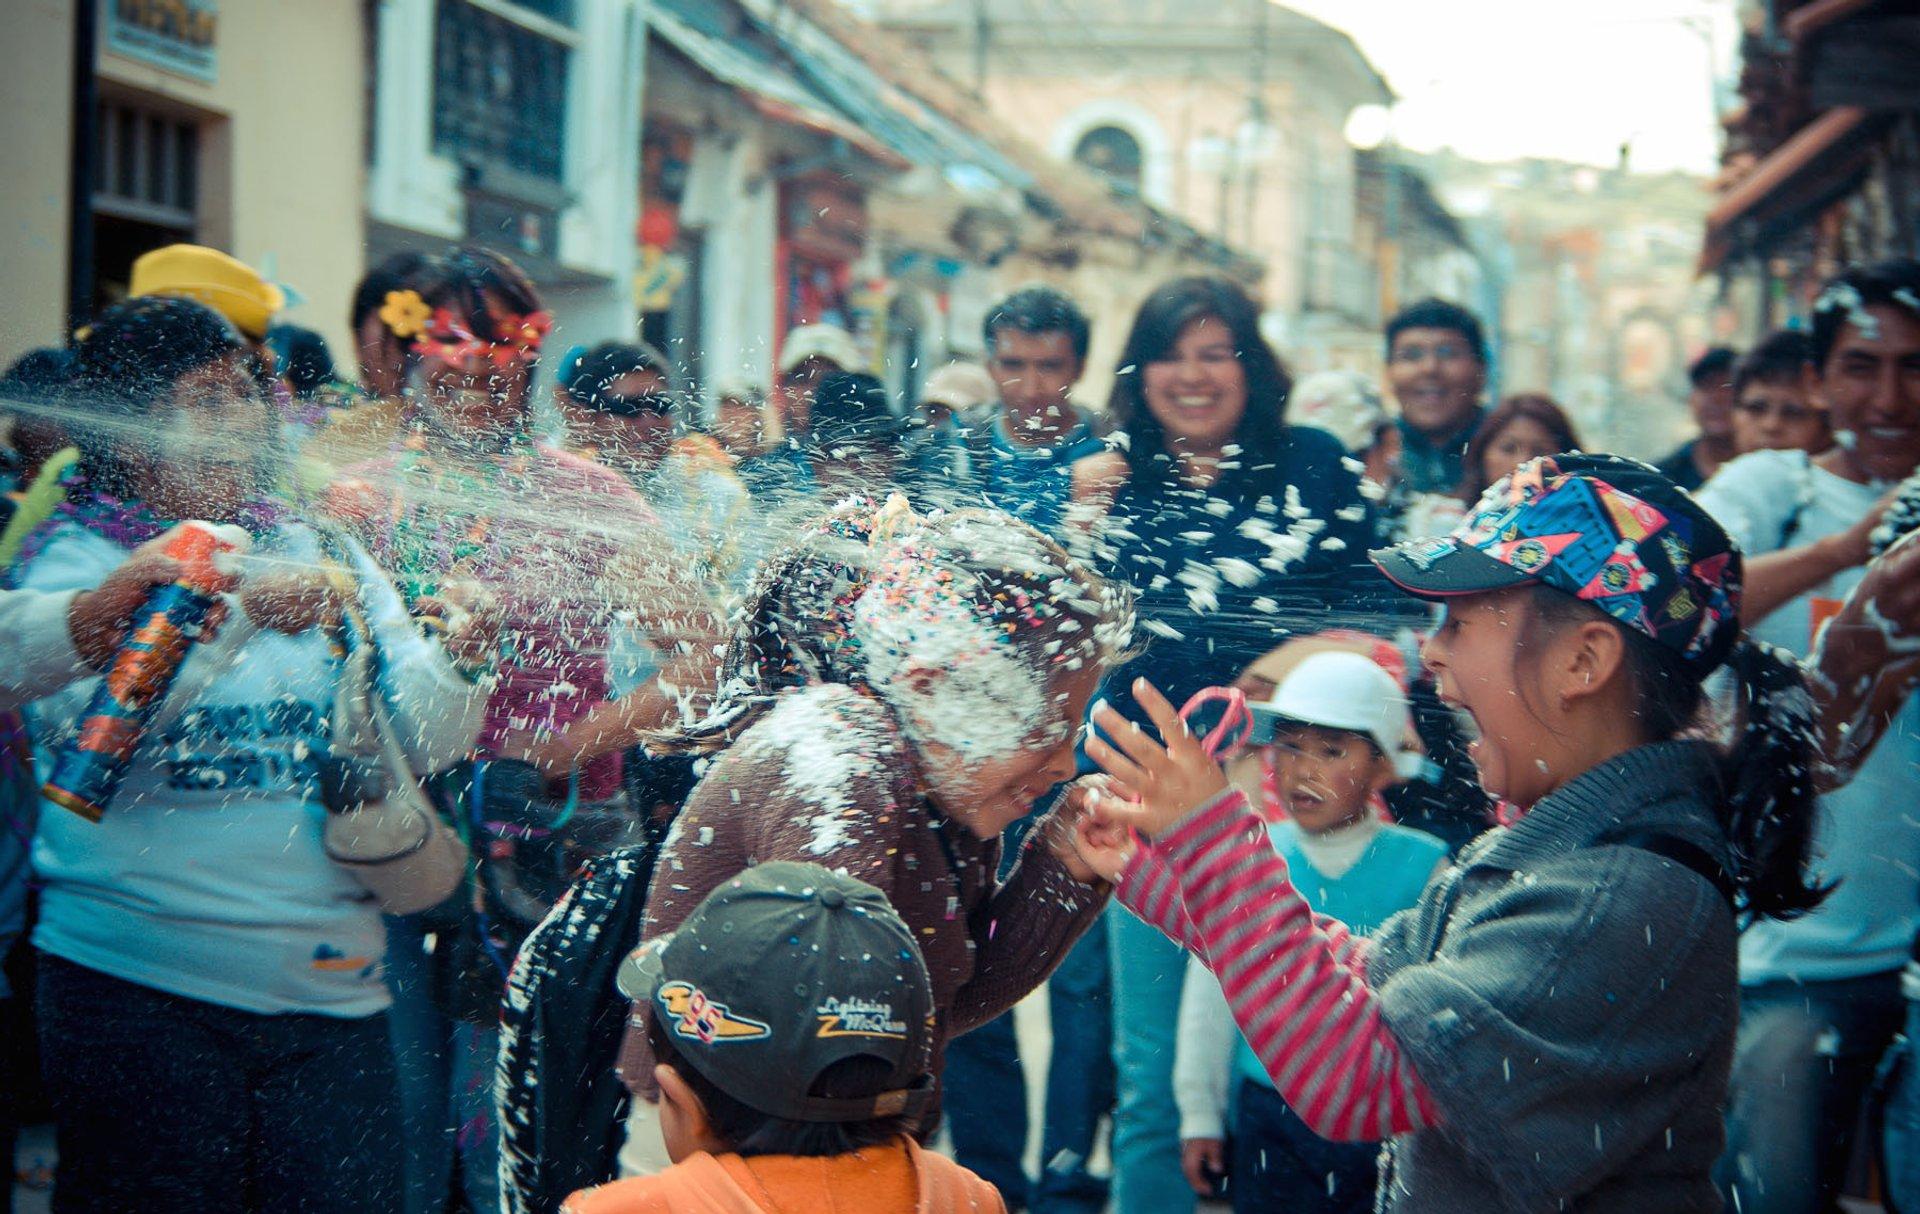 Fiesta de la Virgen de la Candelaria in Peru - Best Season 2020